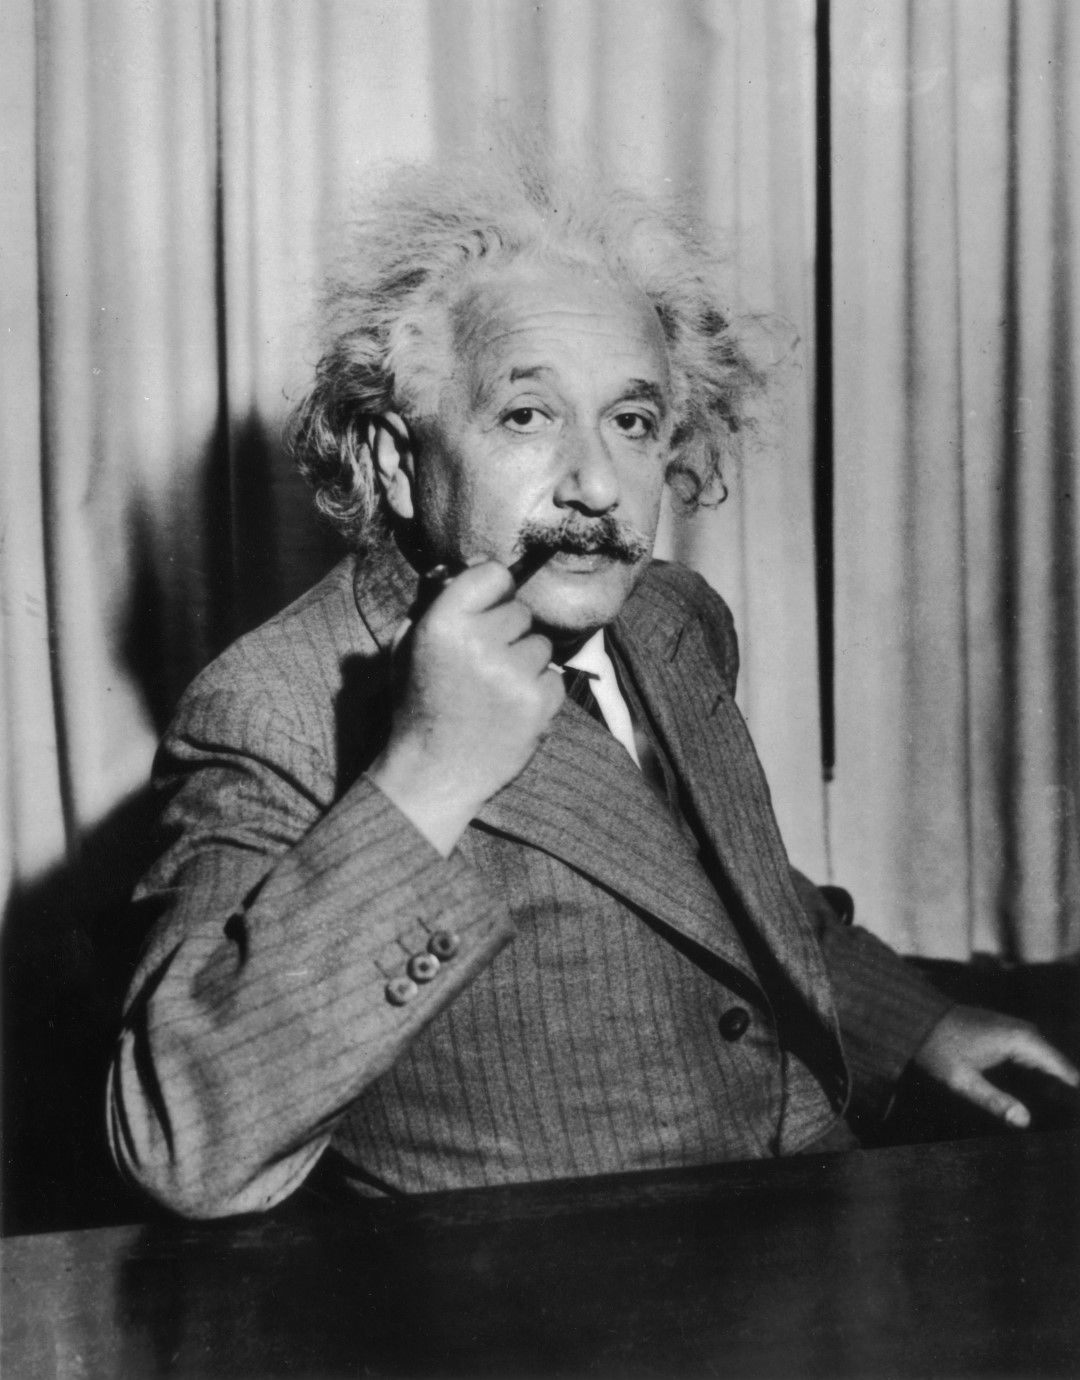 Алберт Айнщайн през 1933 г.